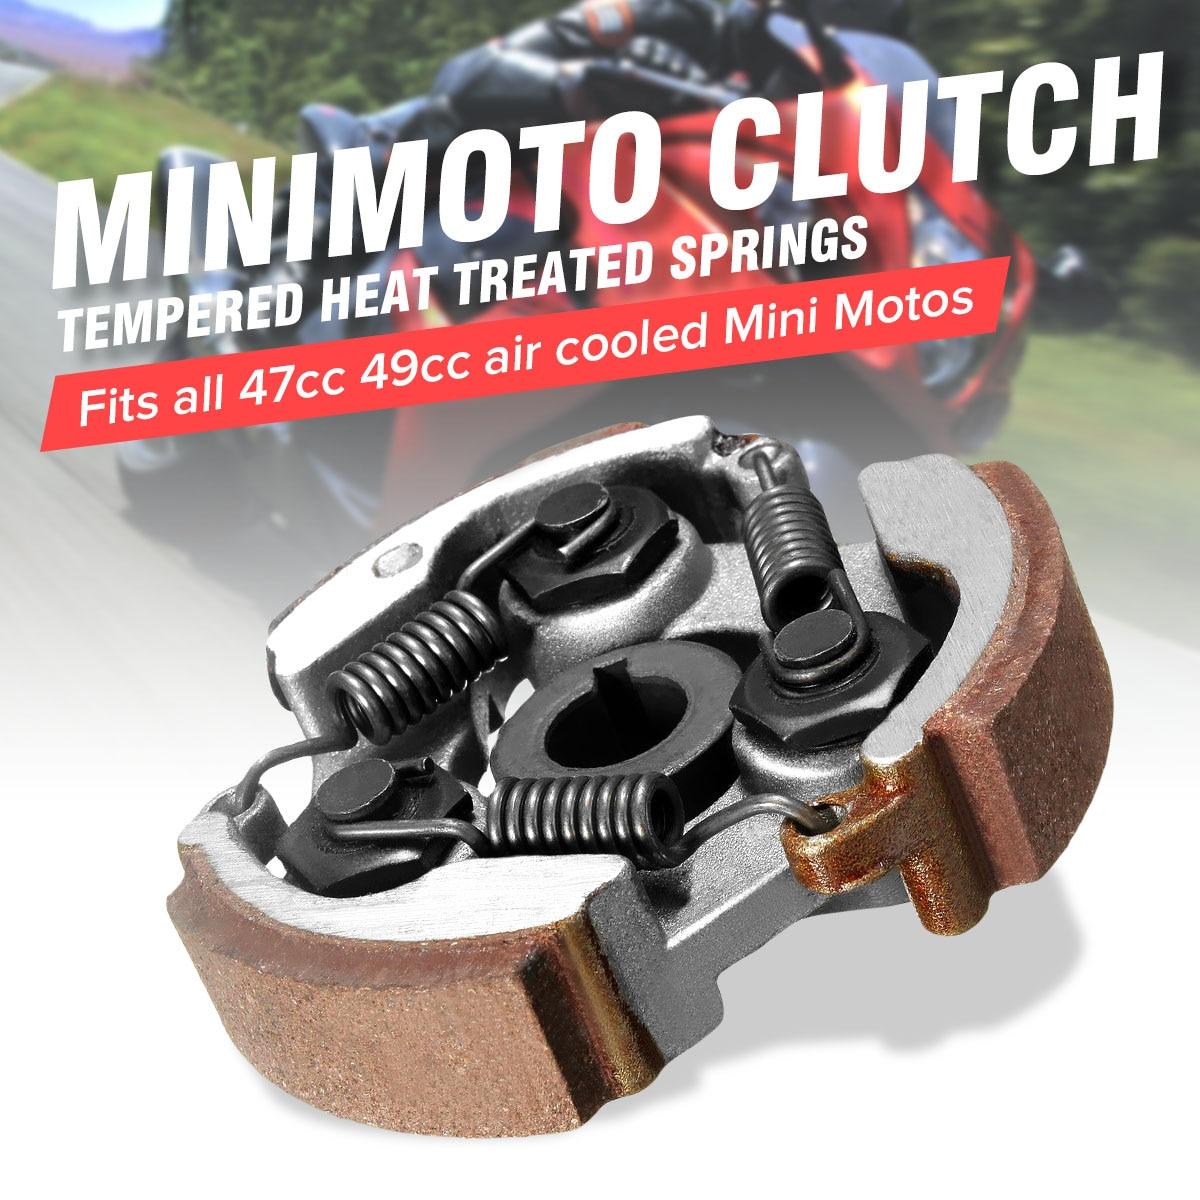 2 course 47cc 49cc Mini moto Embrayage Centrifuge alliage Mini moto Dirt Bike Atv Quad 3 Chaussures Printemps